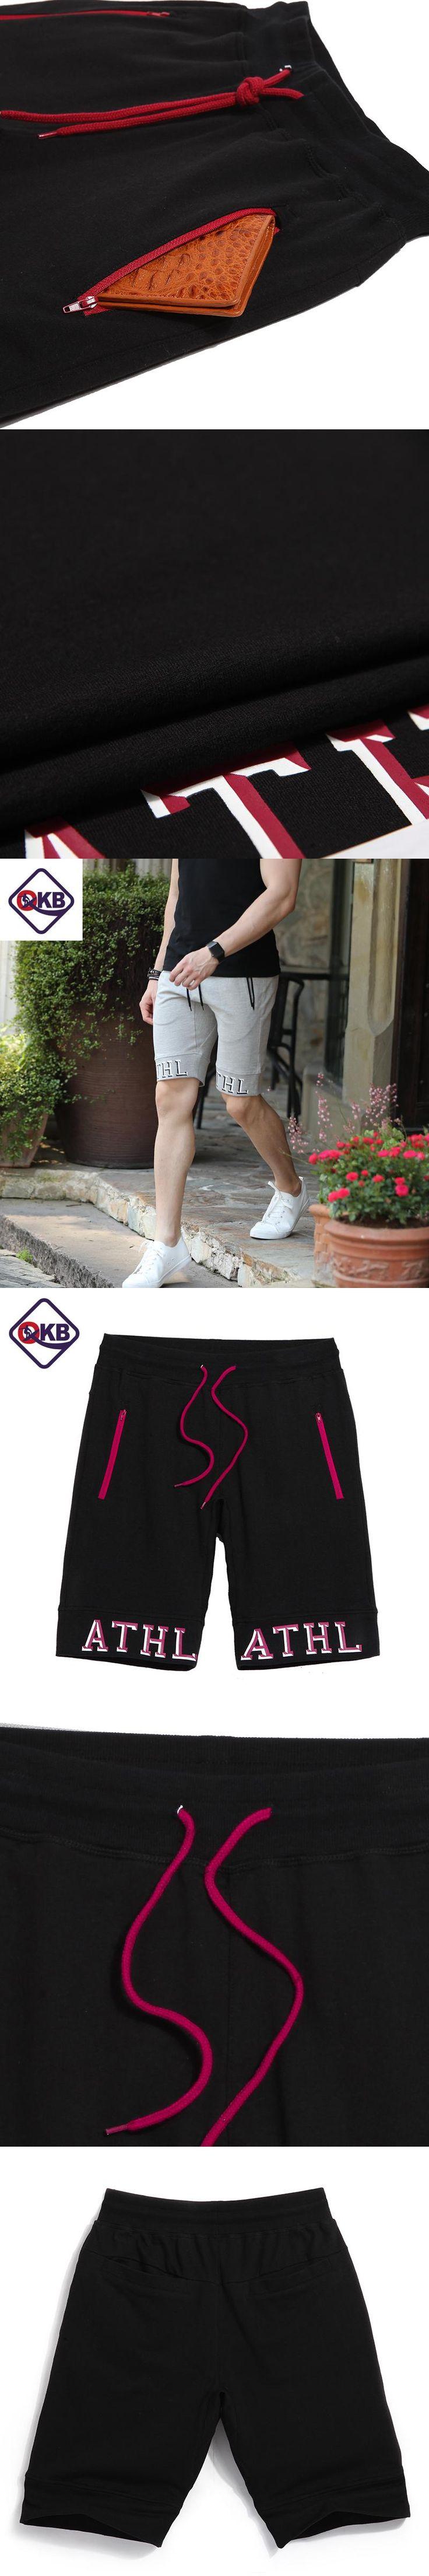 QIKERBONG 2017 Summer Casual Shorts Loose Knitted Bermuda Masculina Ventilate Elastic Waistband Pantalones Cortos Hombre Deporte